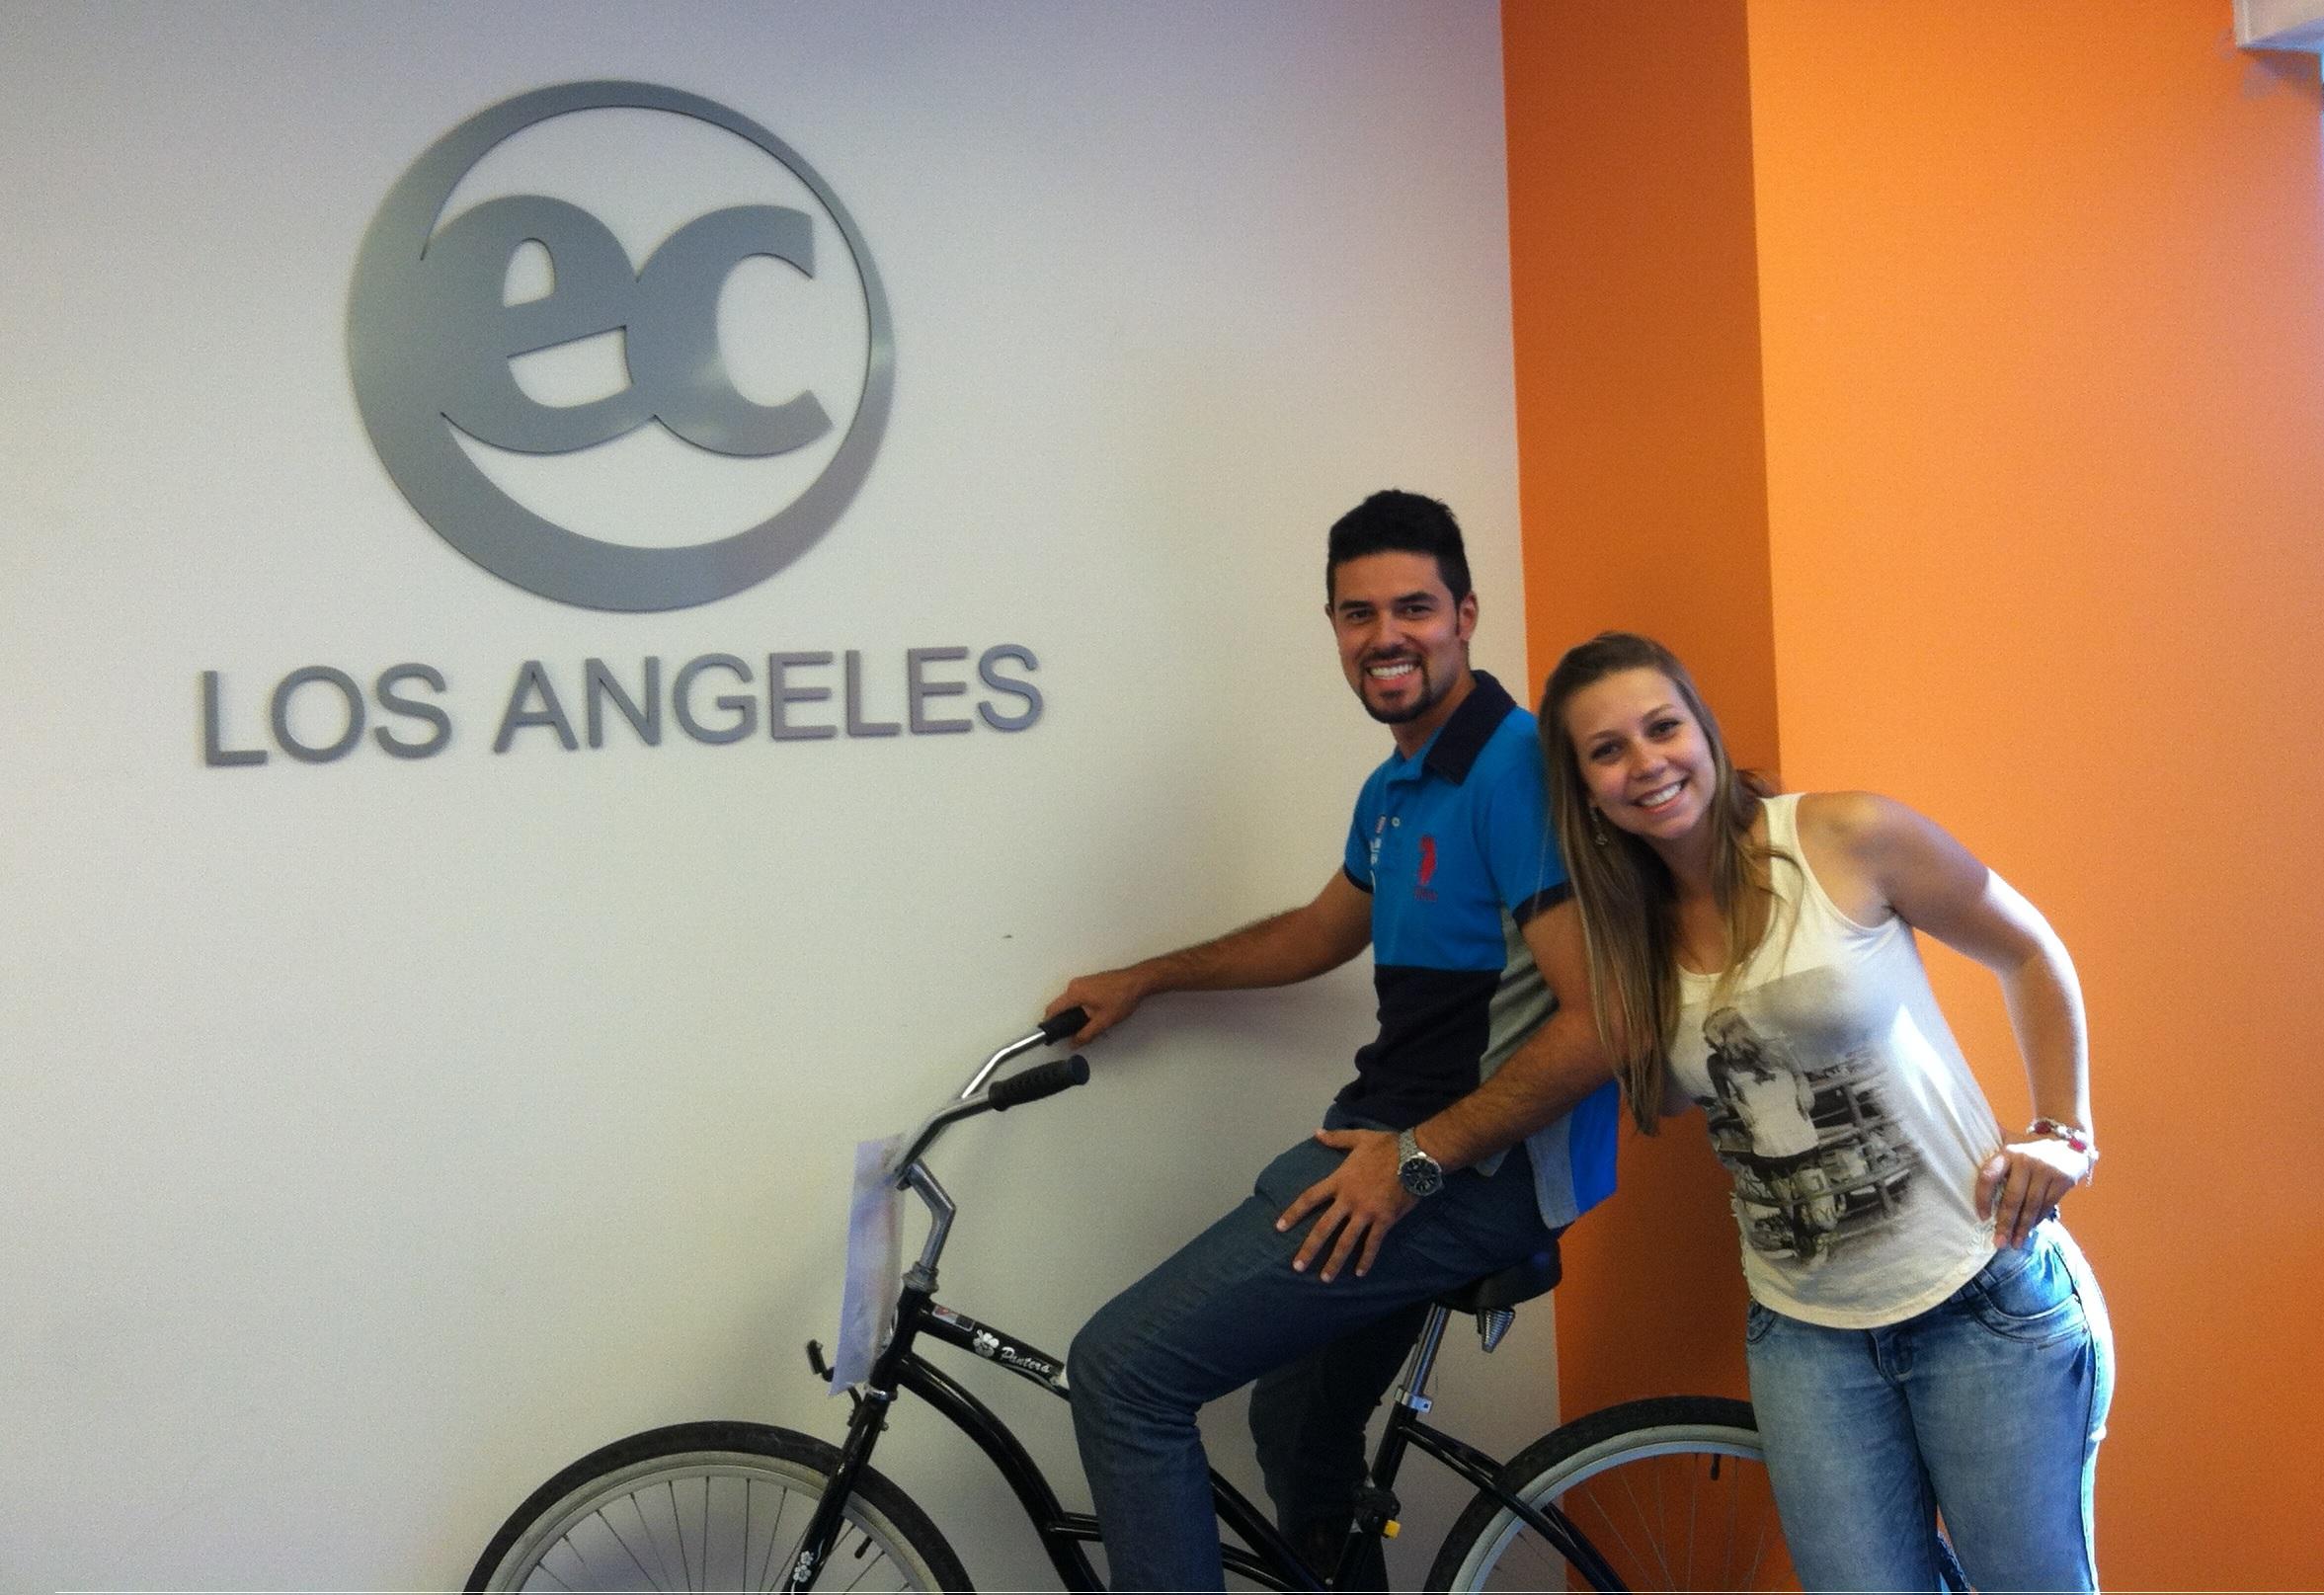 ESL students in Los Angeles